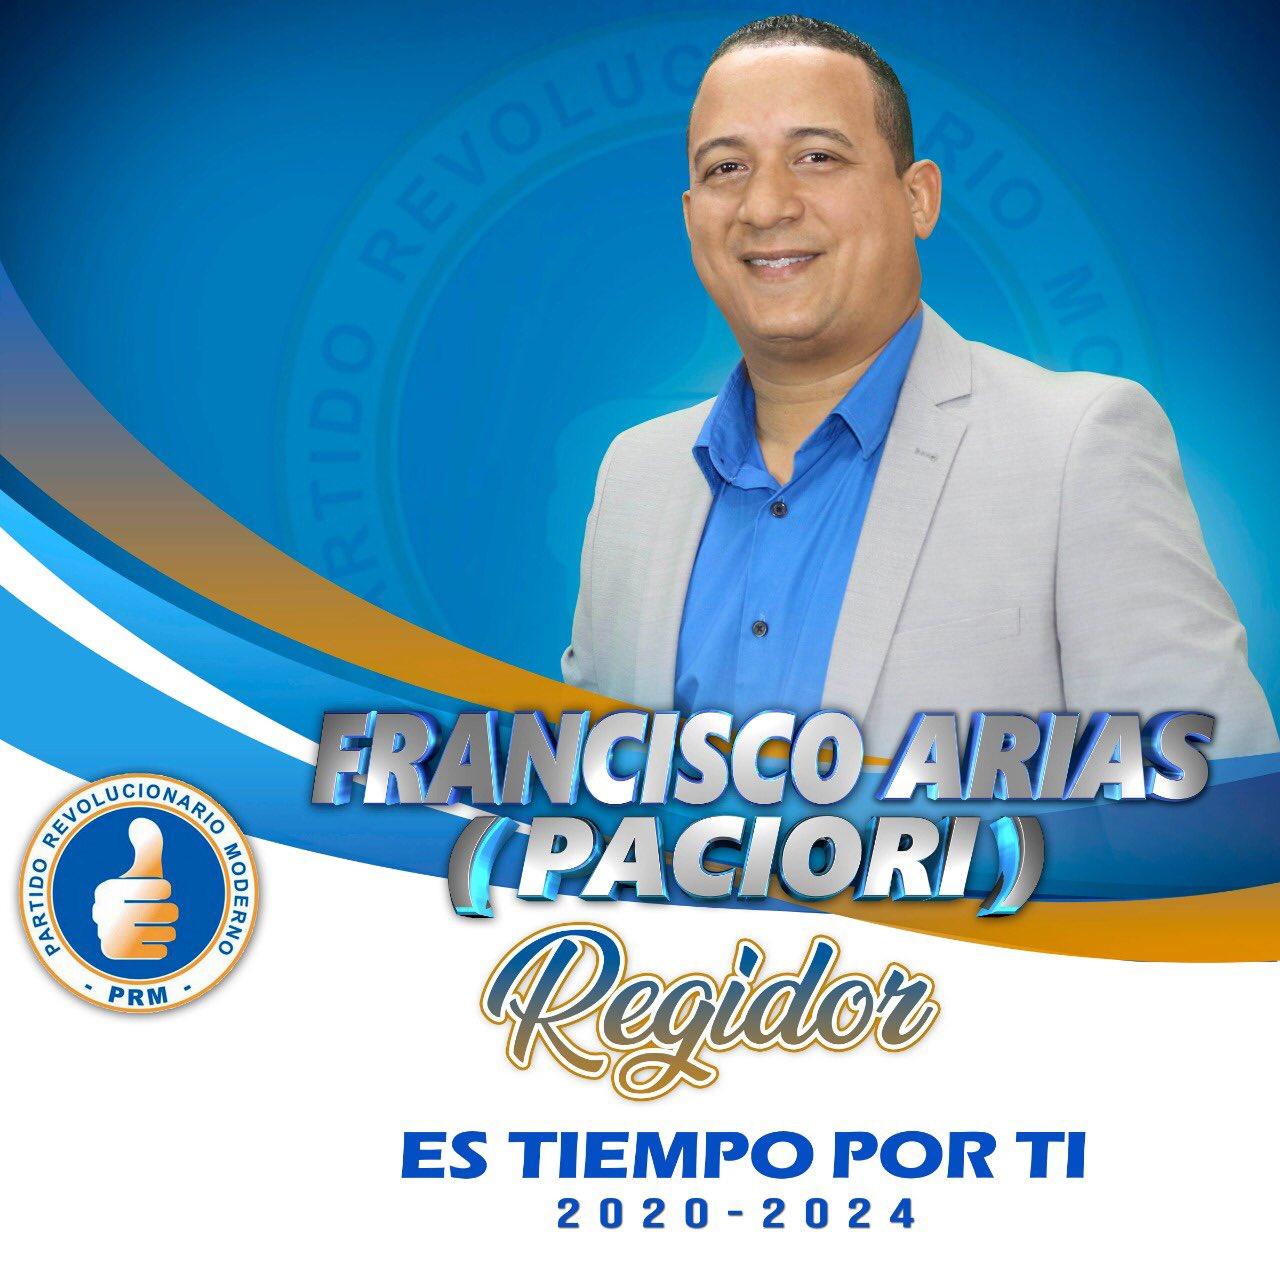 Francisco Arias -Paciolri. Regidor PRM